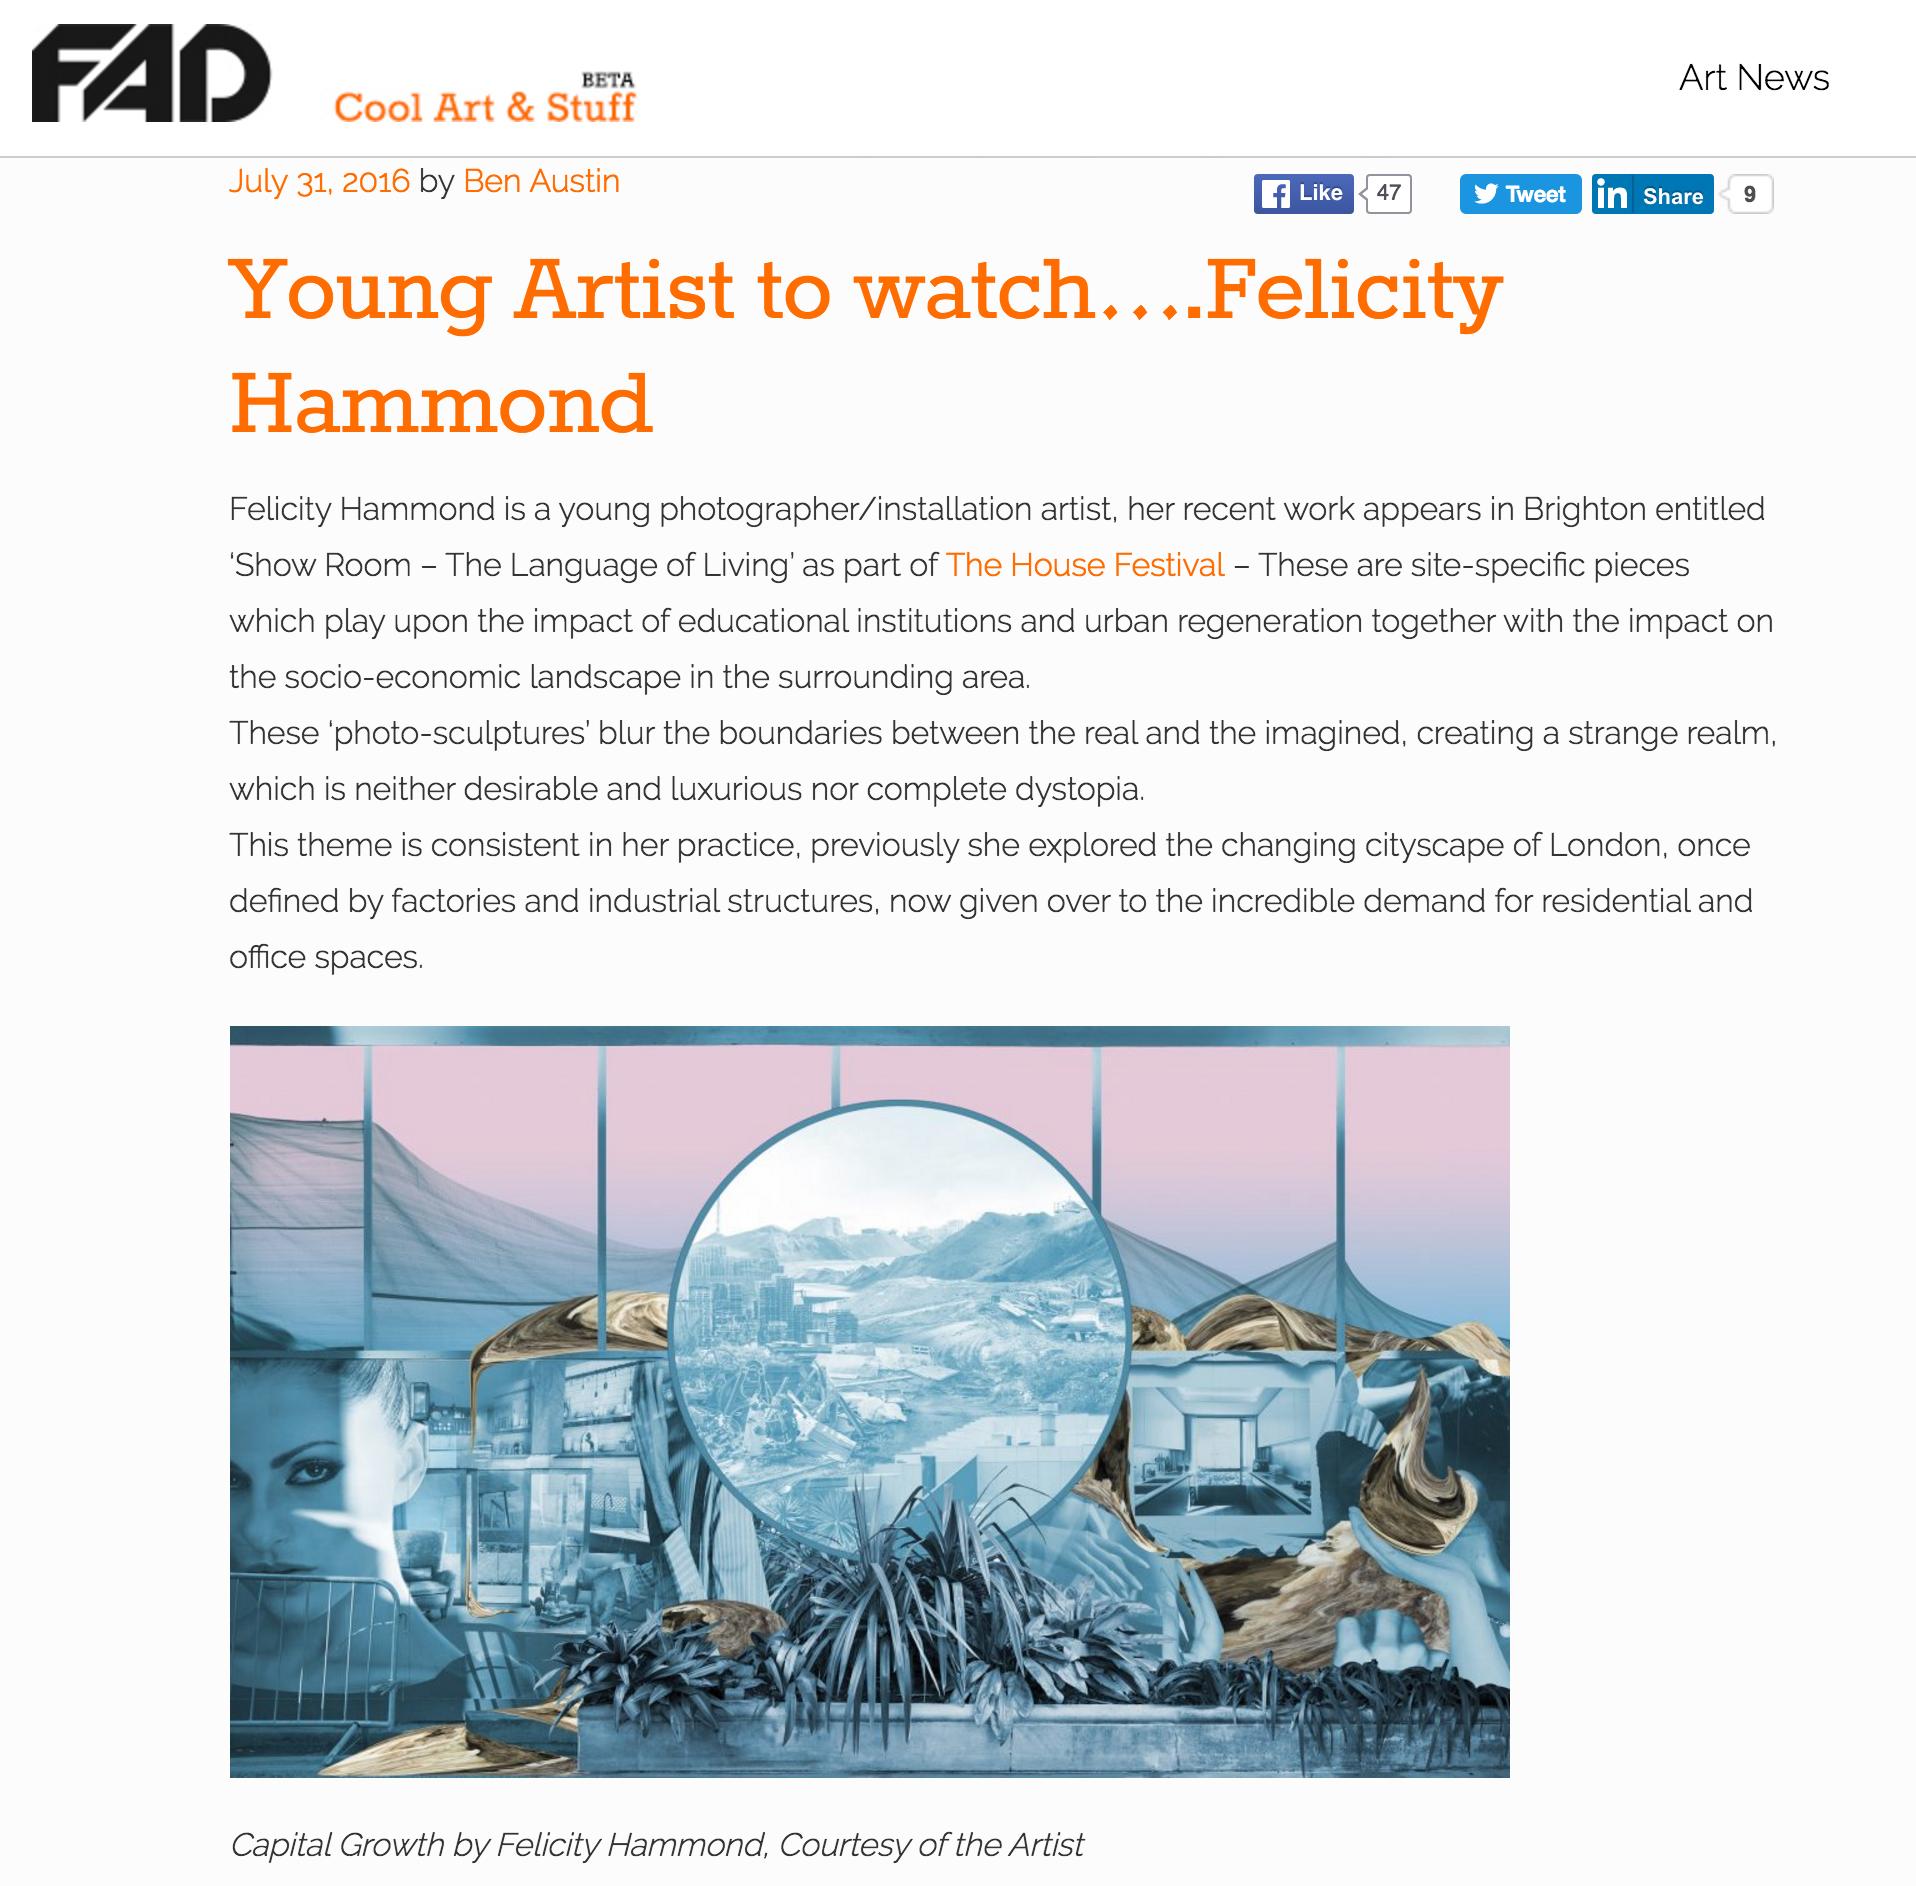 Source http://fadmagazine.com/2016/07/31/young-artist-watch-felicity-hammond/?utm_content=bufferbd735